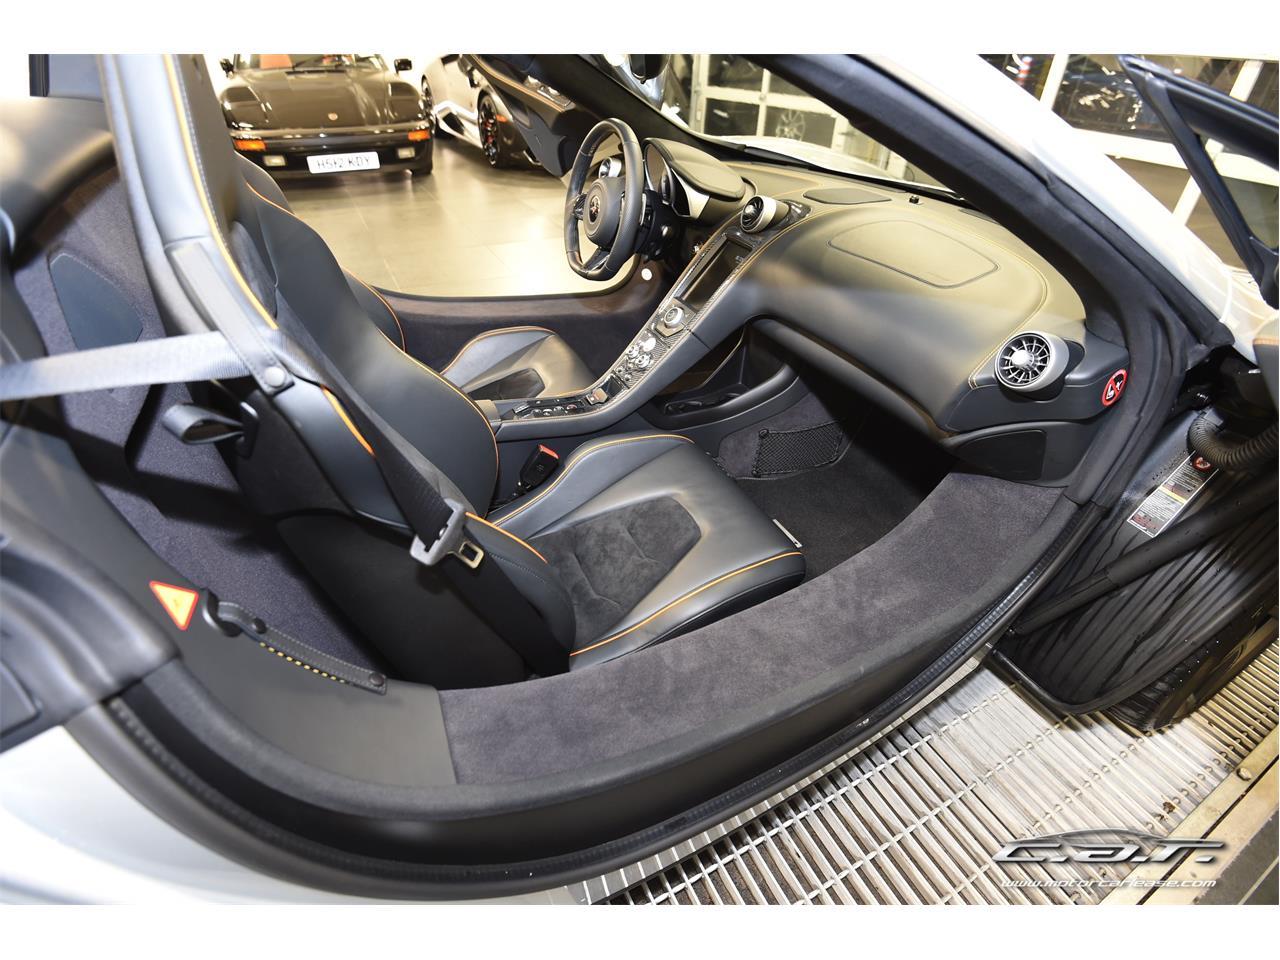 2016 McLaren 650S (CC-1215273) for sale in Montreal, Quebec